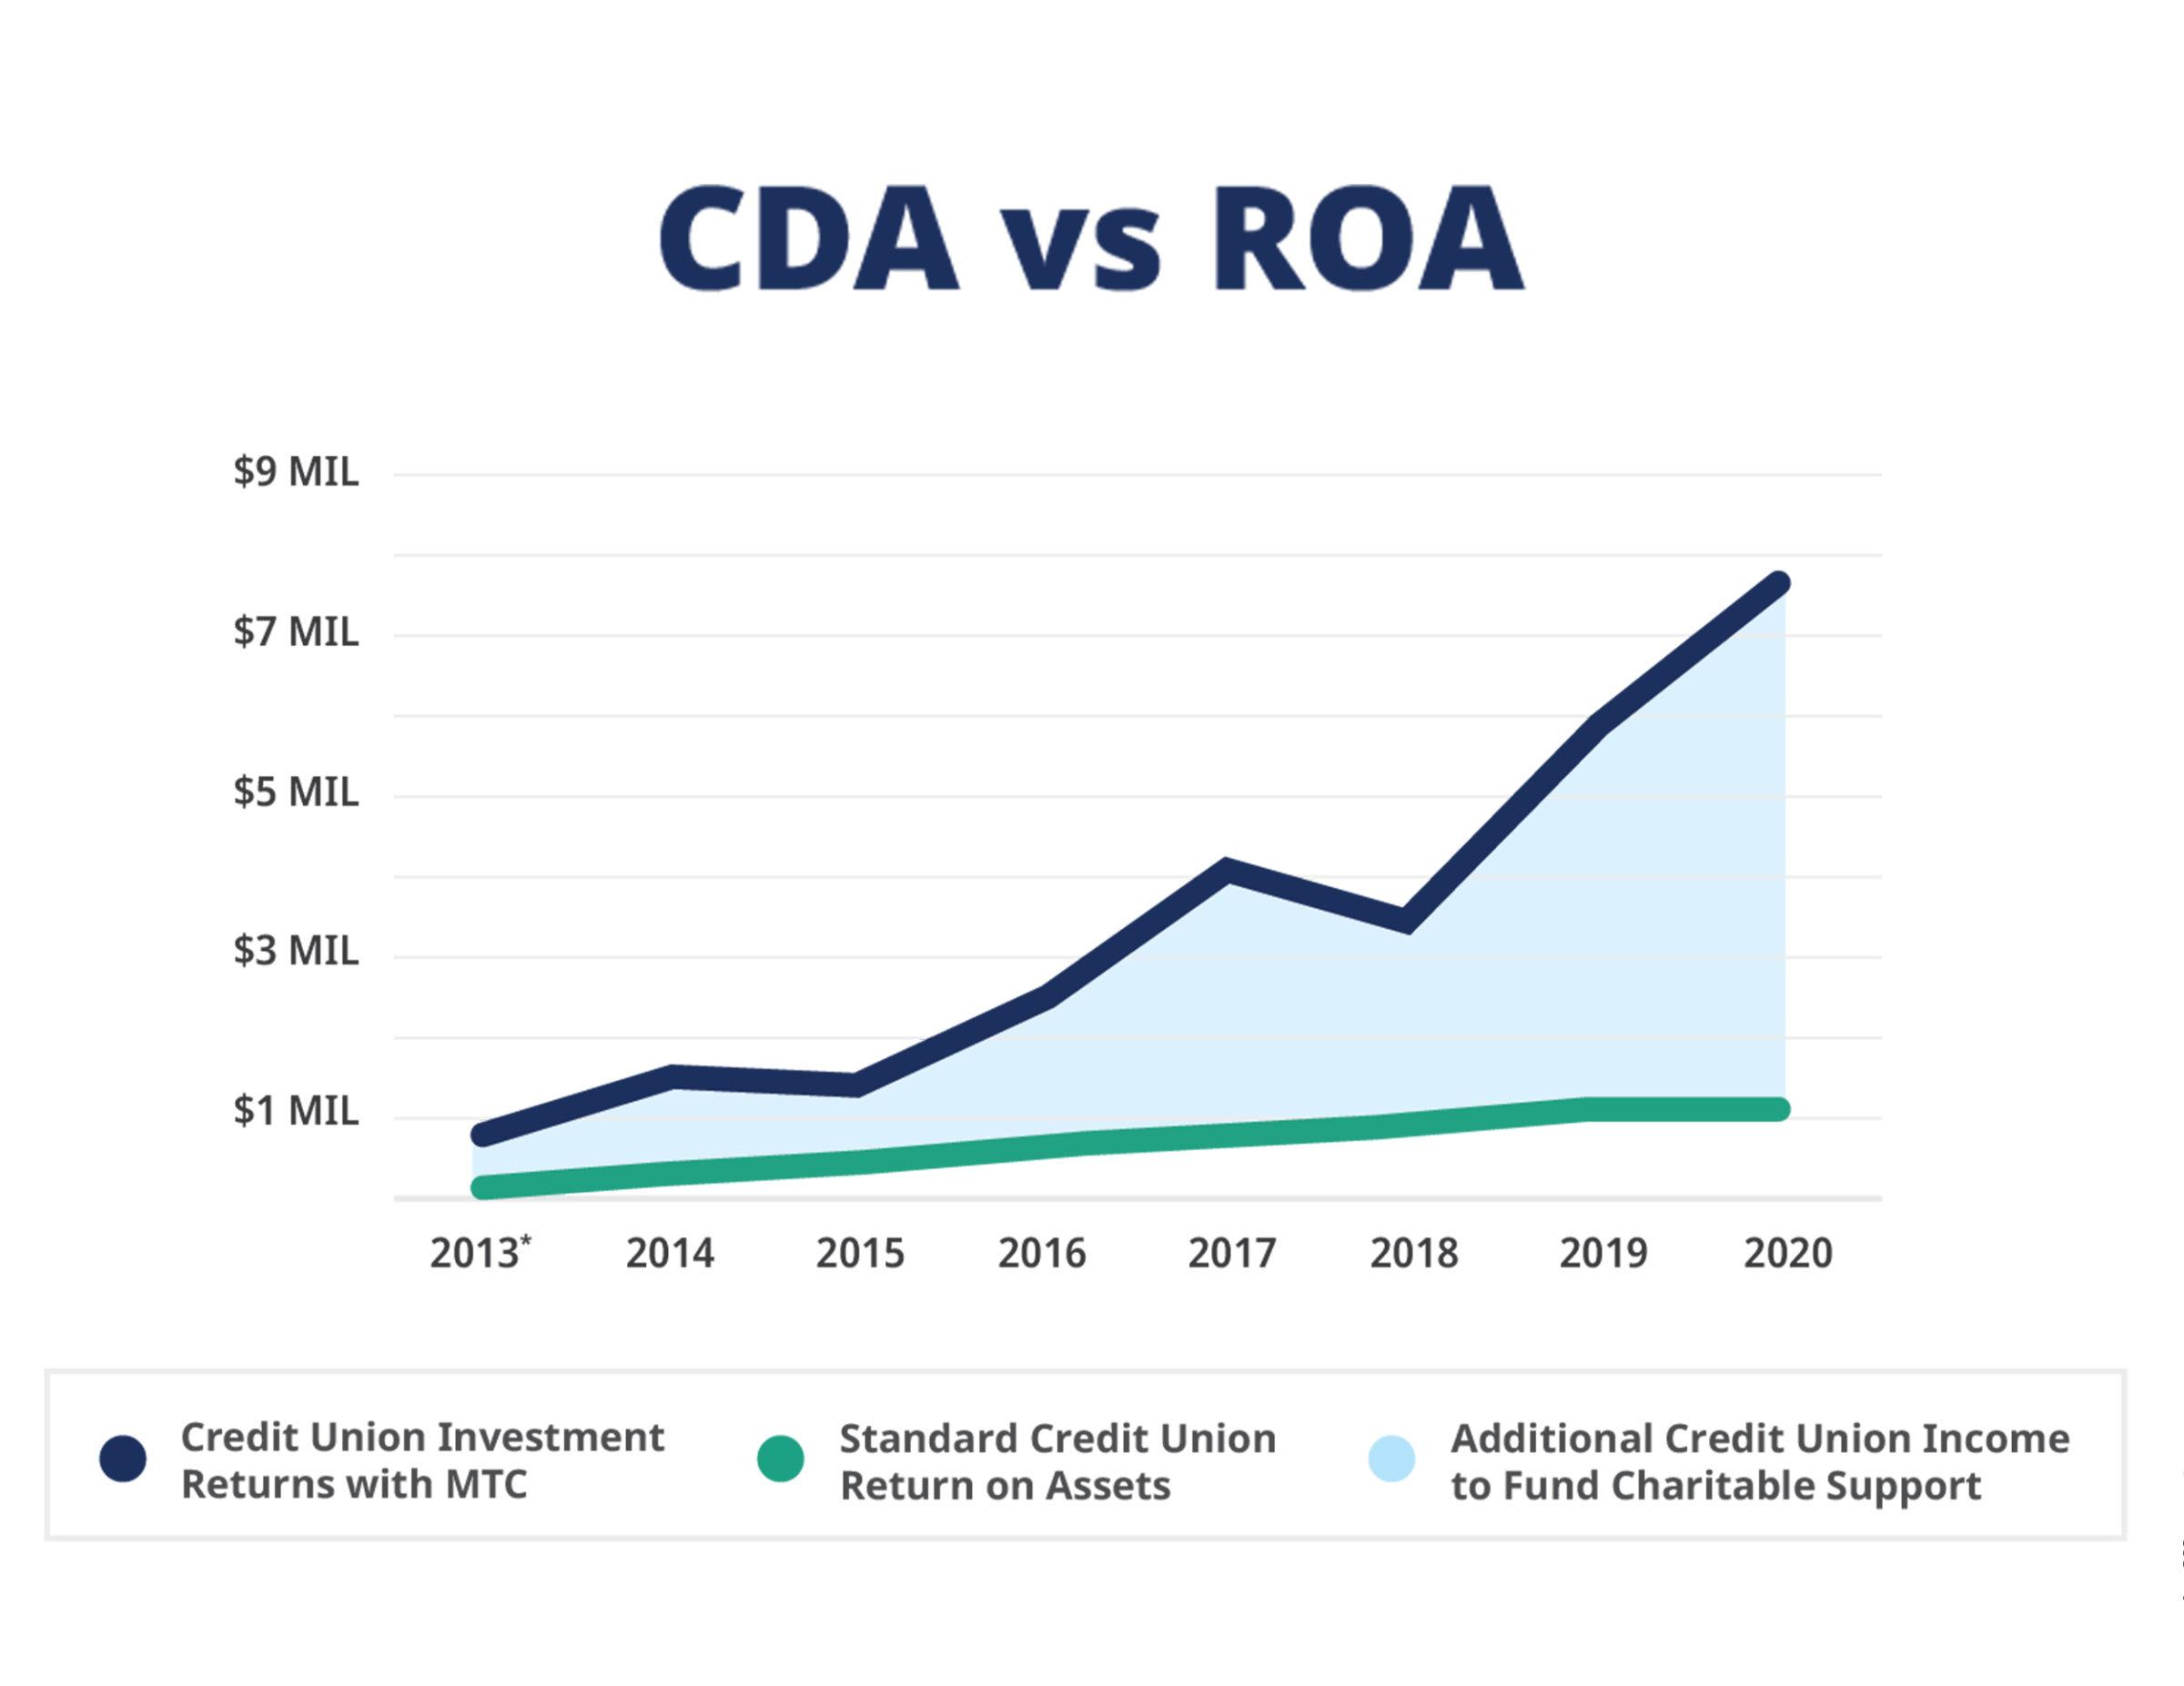 CDA vs ROA chart